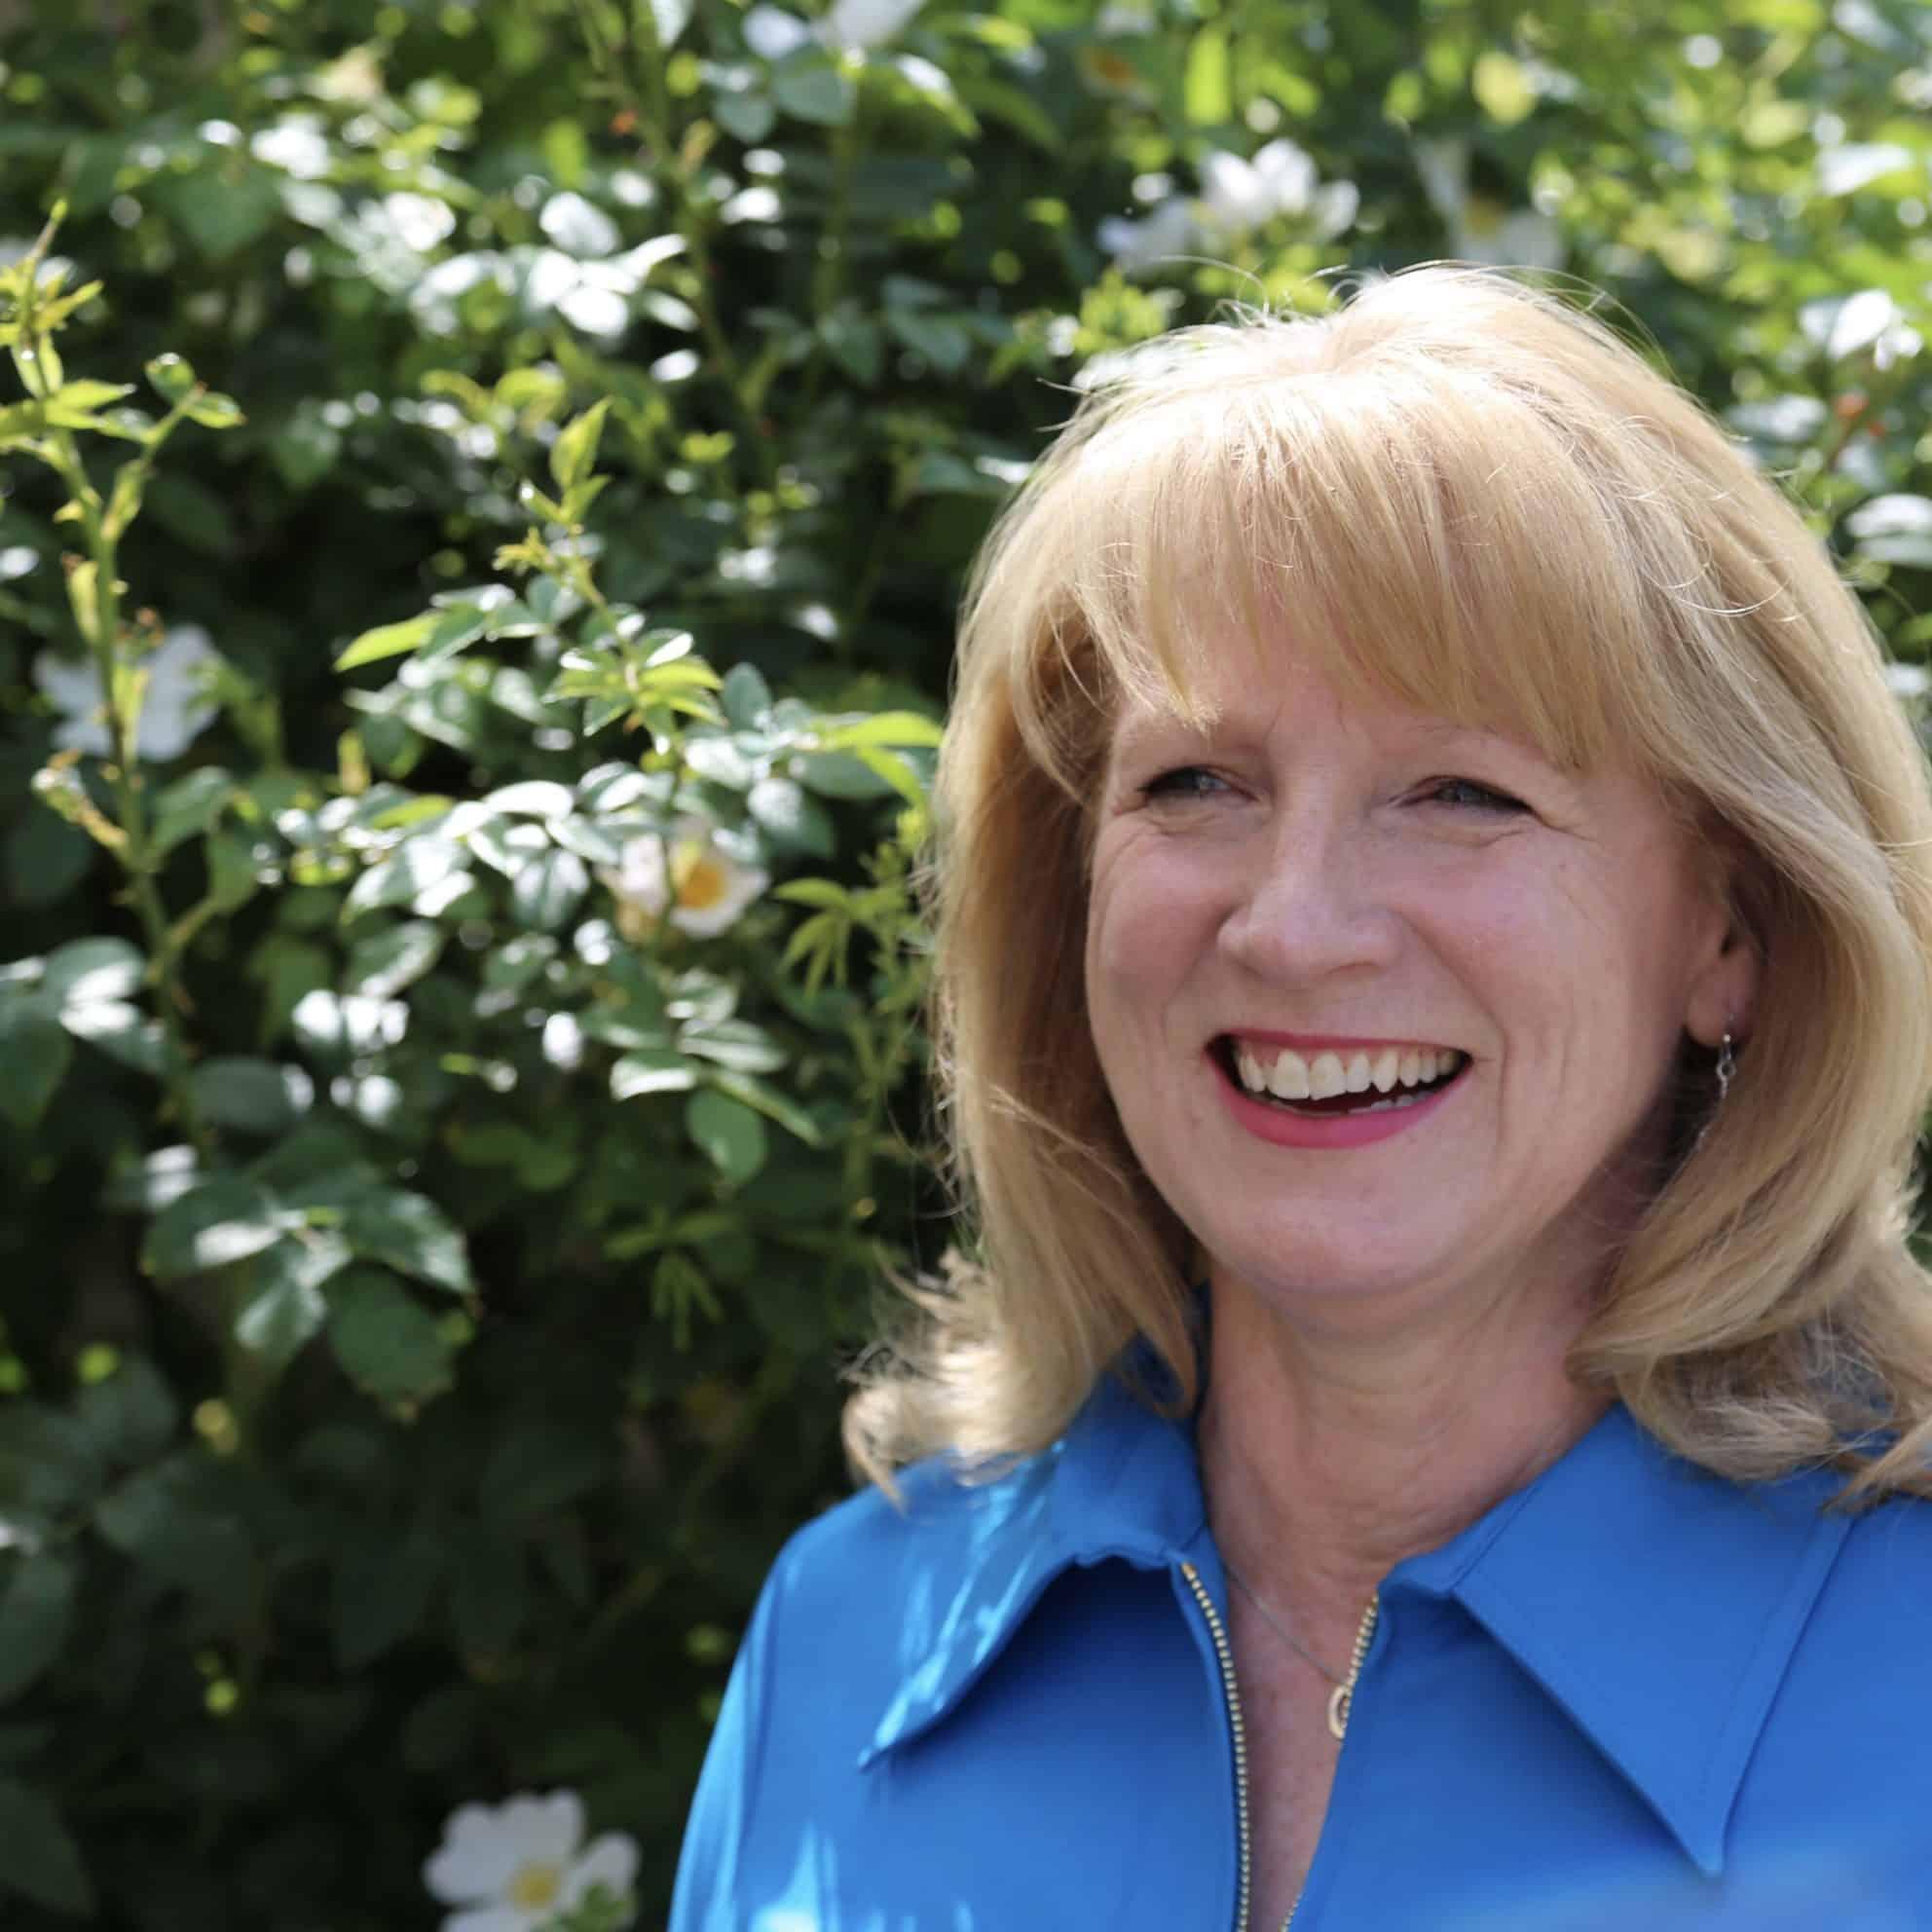 Hilary Dyson Founder of Bridge Financials